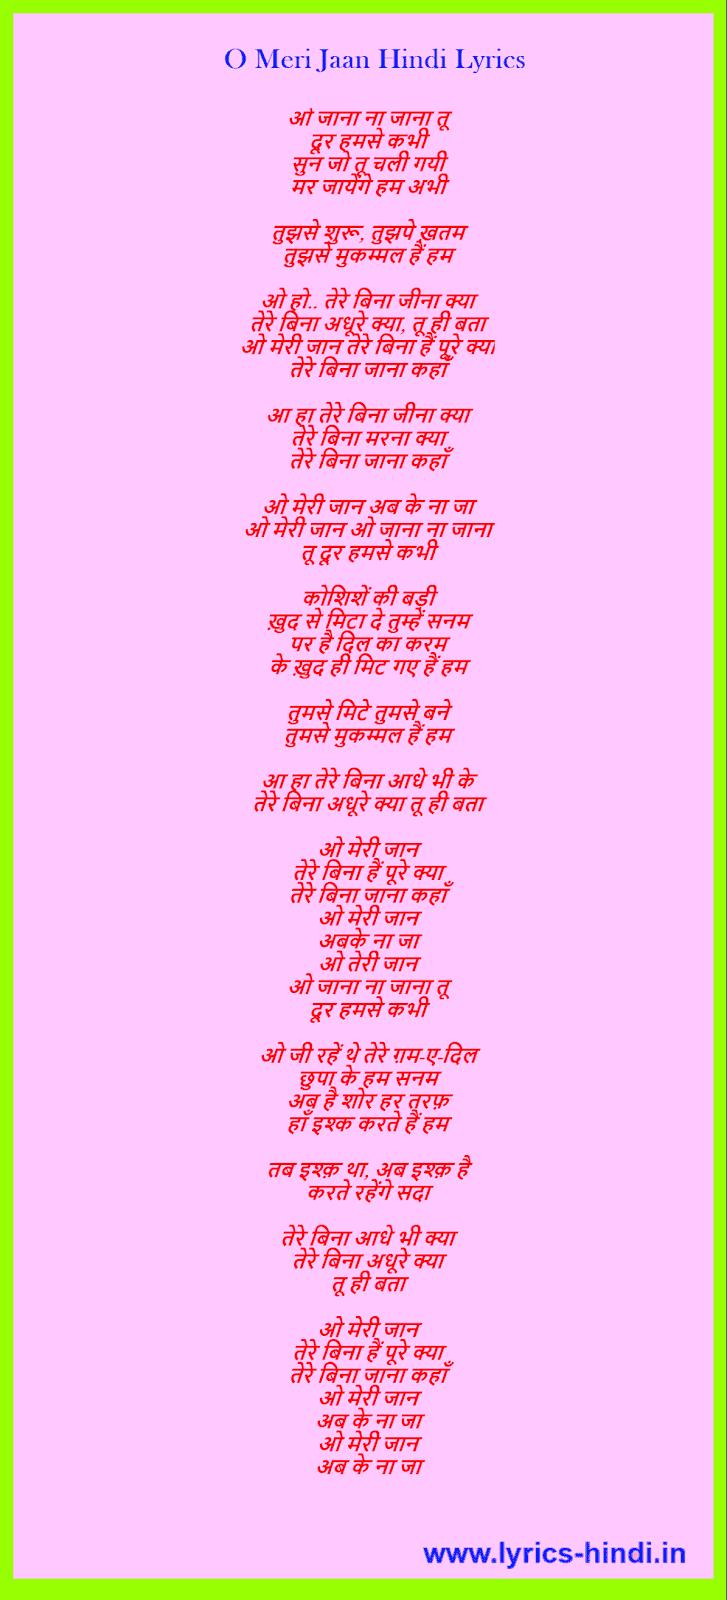 o-meri-jaan-hindi-lyrics